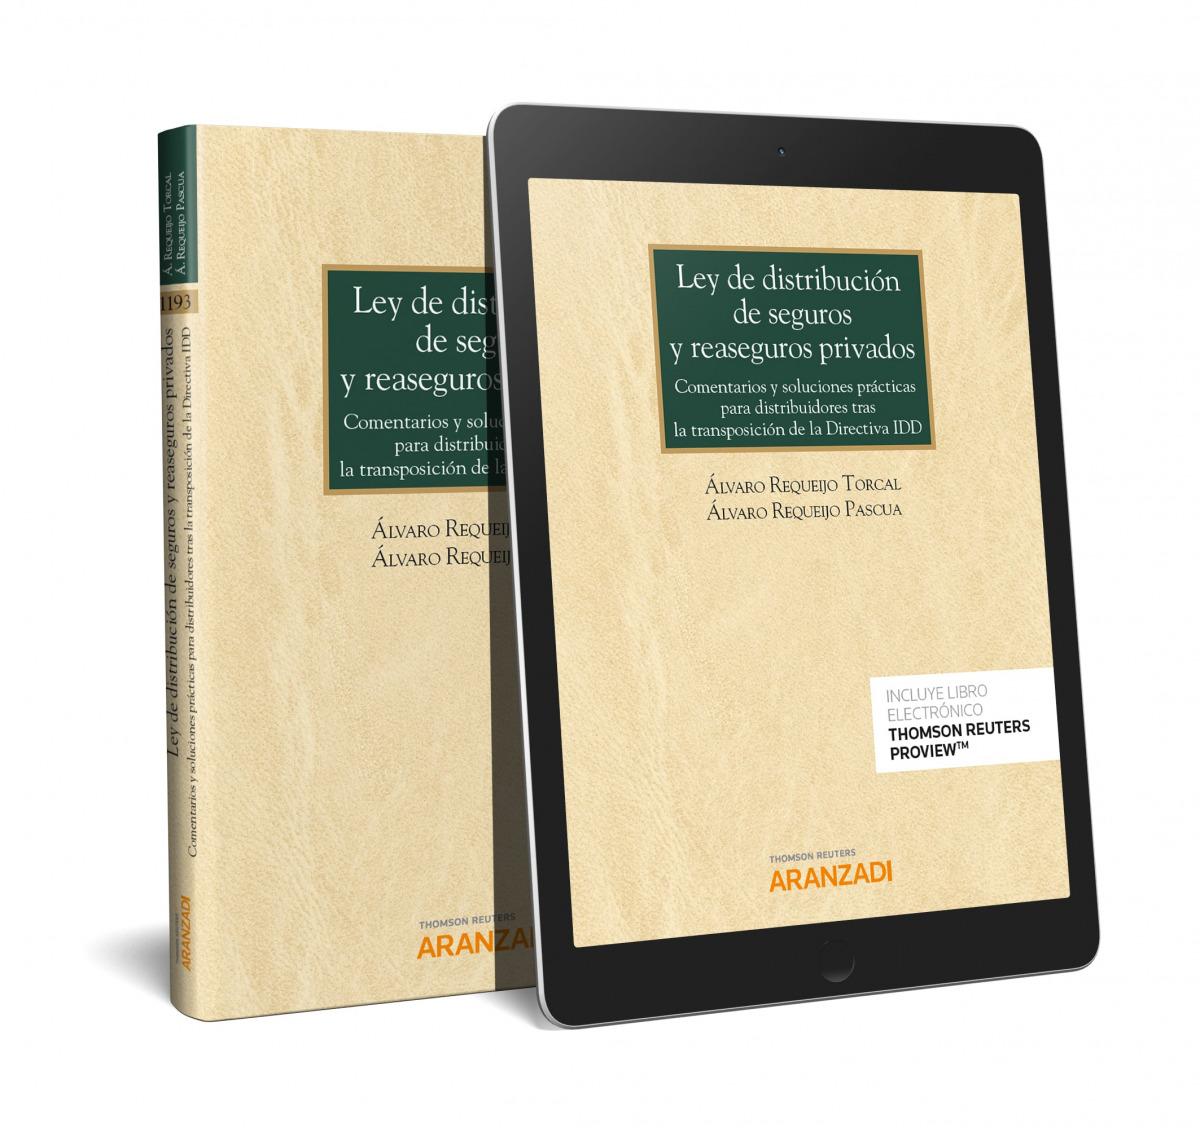 Ley de distribución de seguros y reaseguros privados (Papel + e-book)